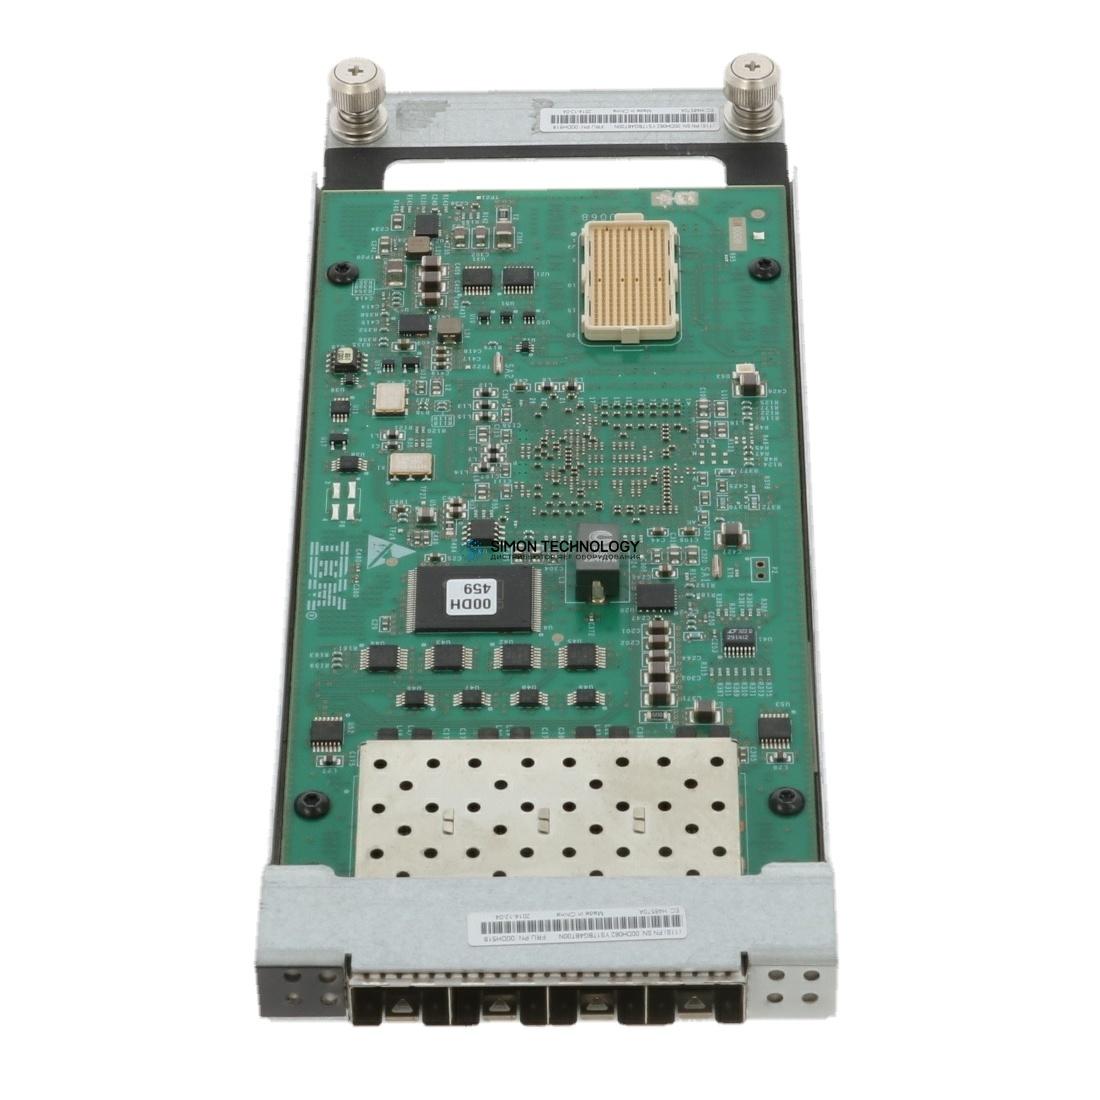 Модуль IBM 4port FC/FCoE adapter card (no SFP) (00DH518)